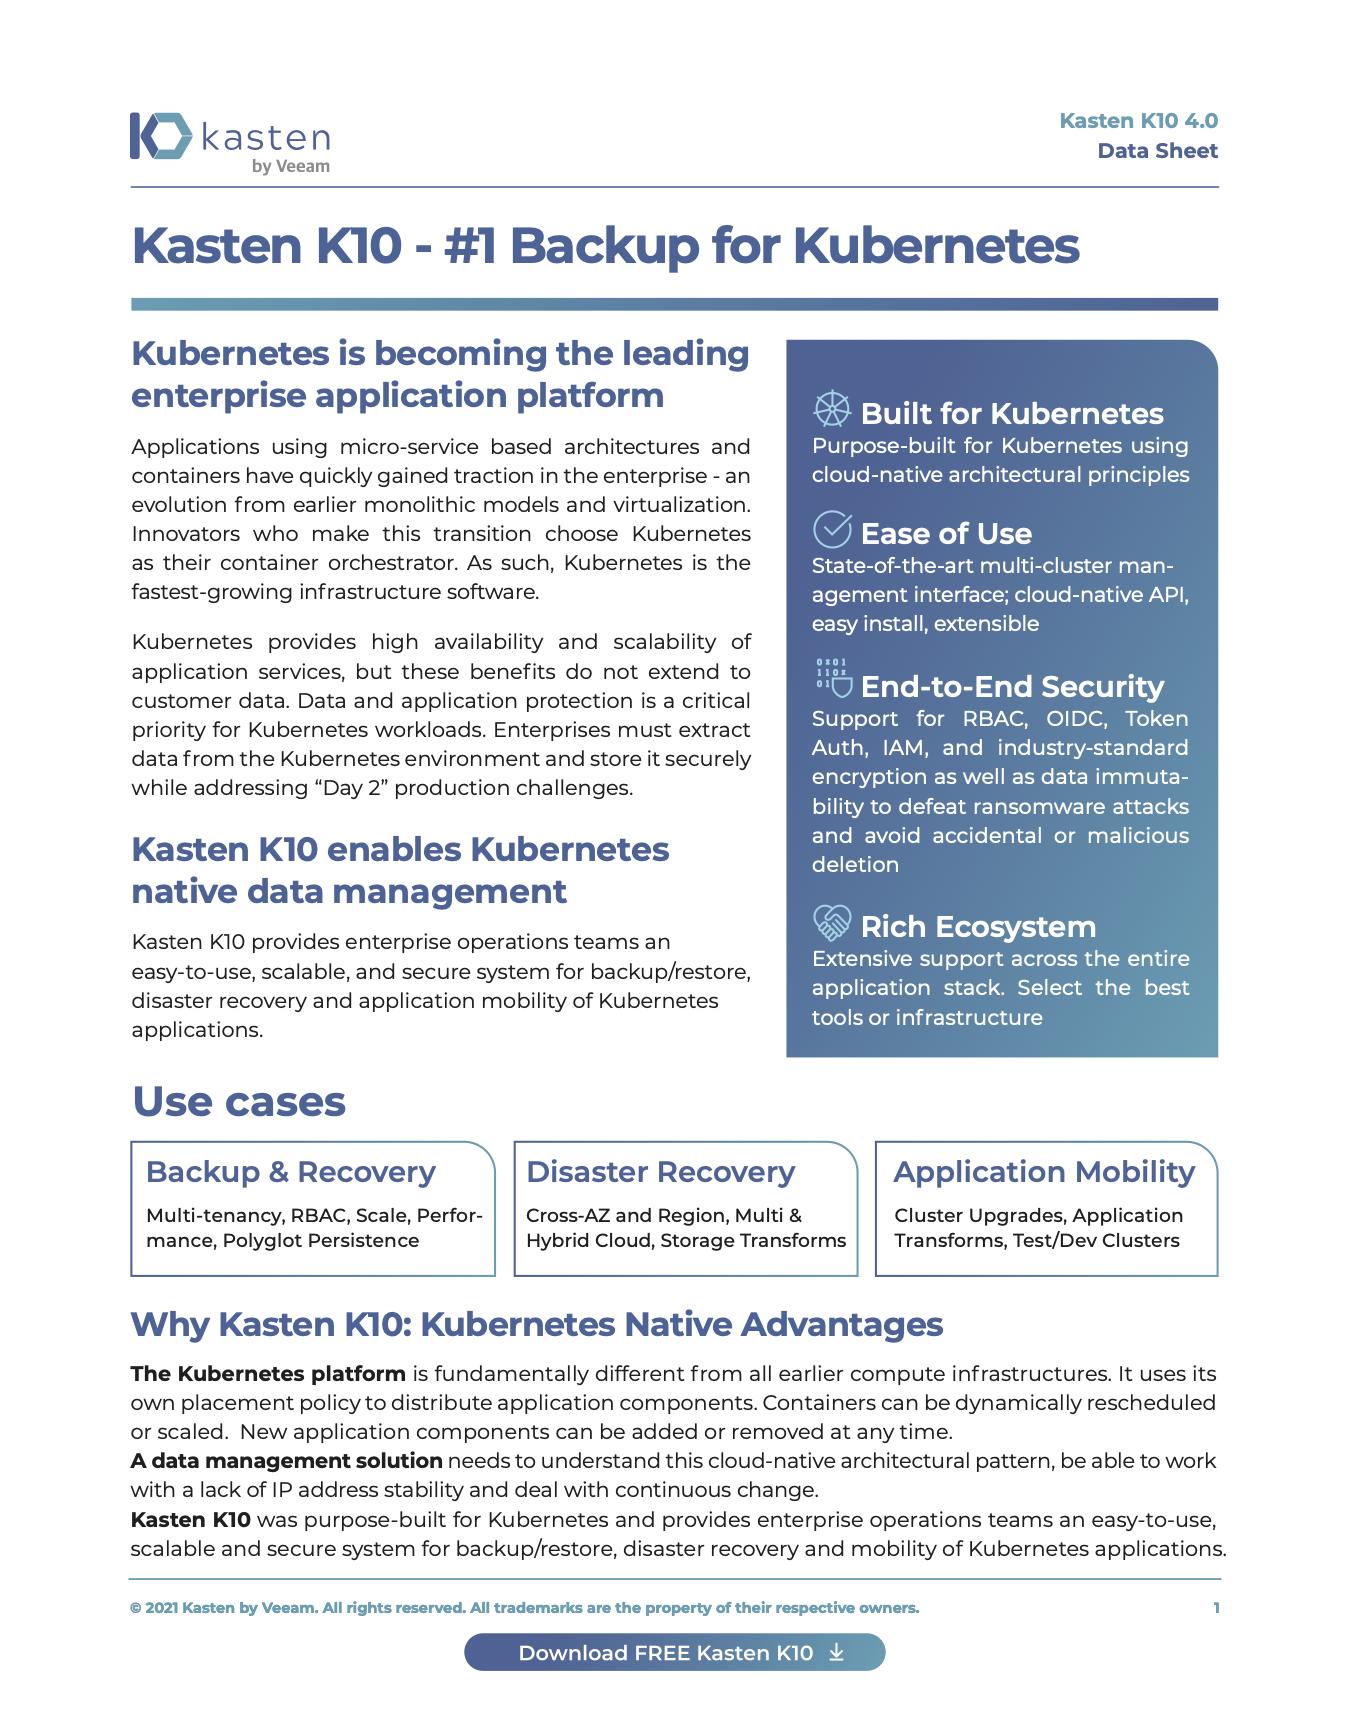 release 4.0 data sheet-thumbnail-resounrces